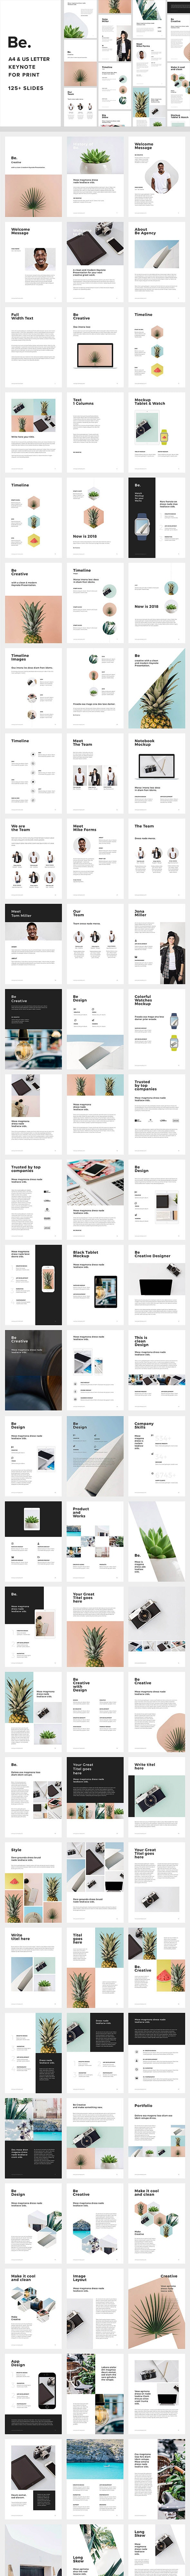 Be. A4 + US Letter Keynote Presentation for Print - Creative Keynote Templates